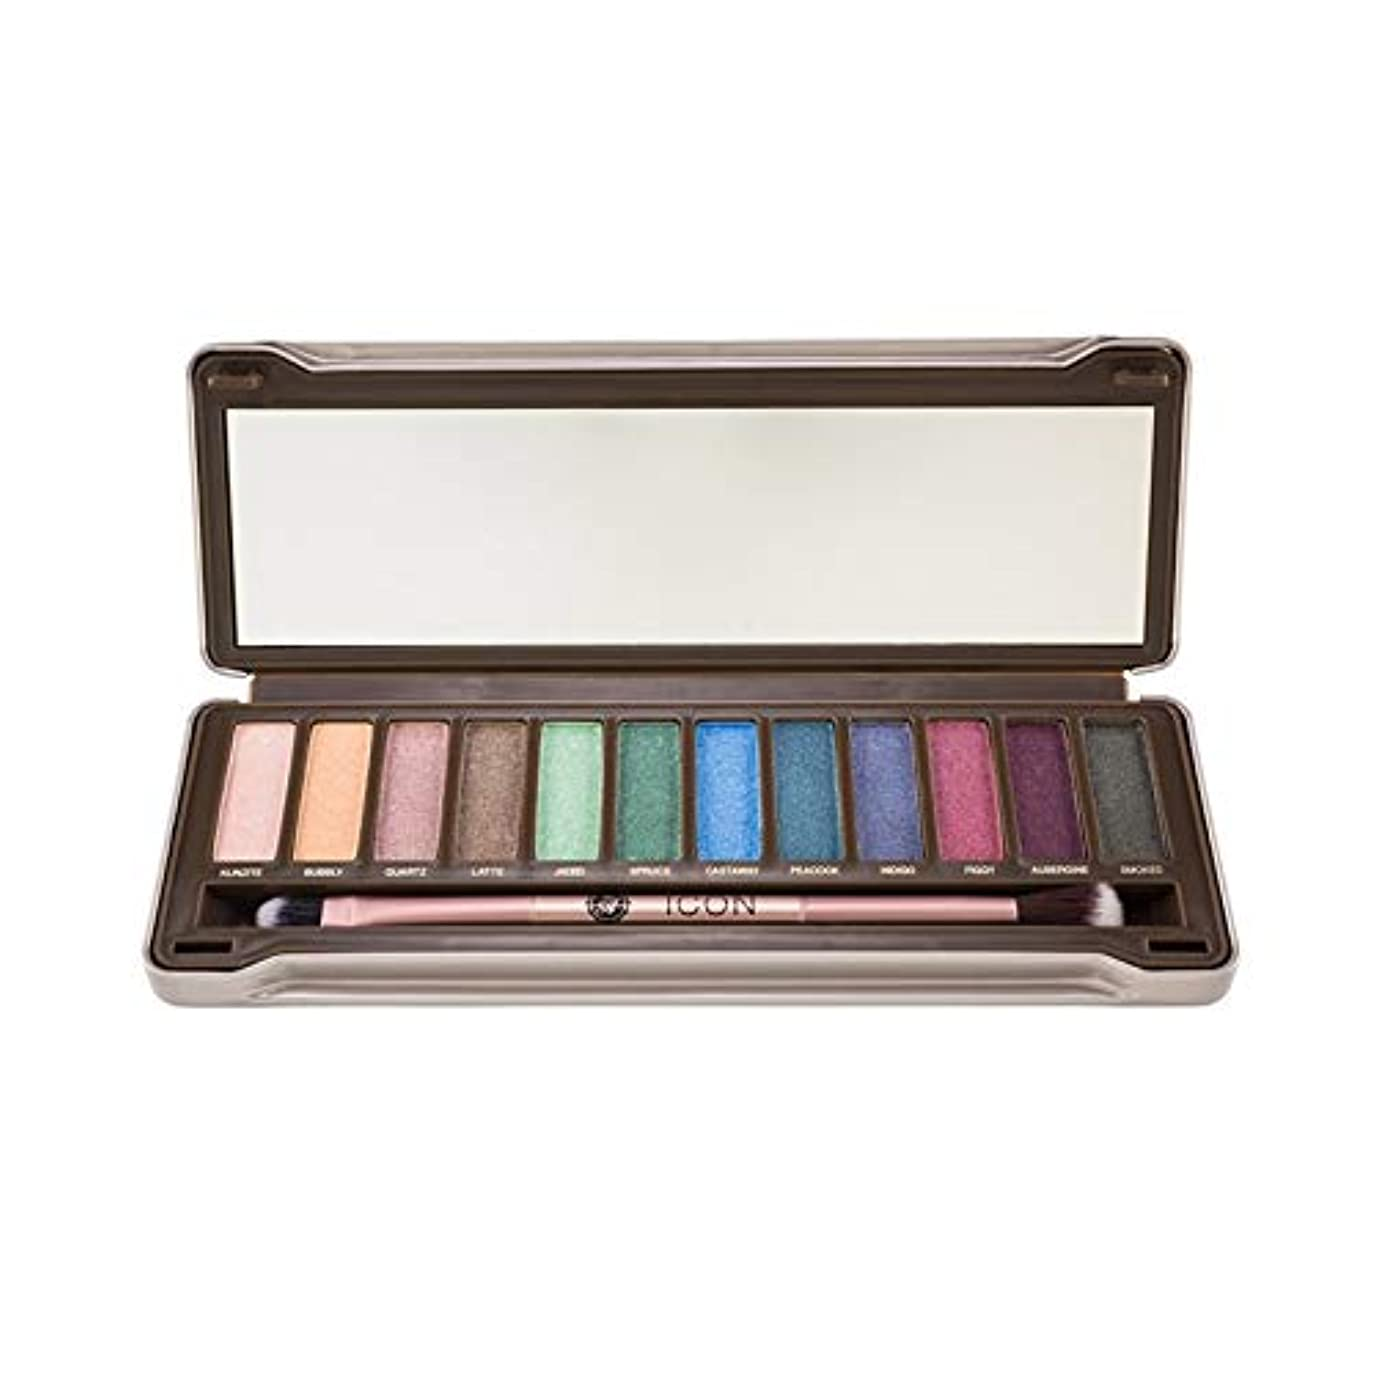 (3 Pack) ABSOLUTE Icon Eyeshadow Palette - Noir Garden (並行輸入品)